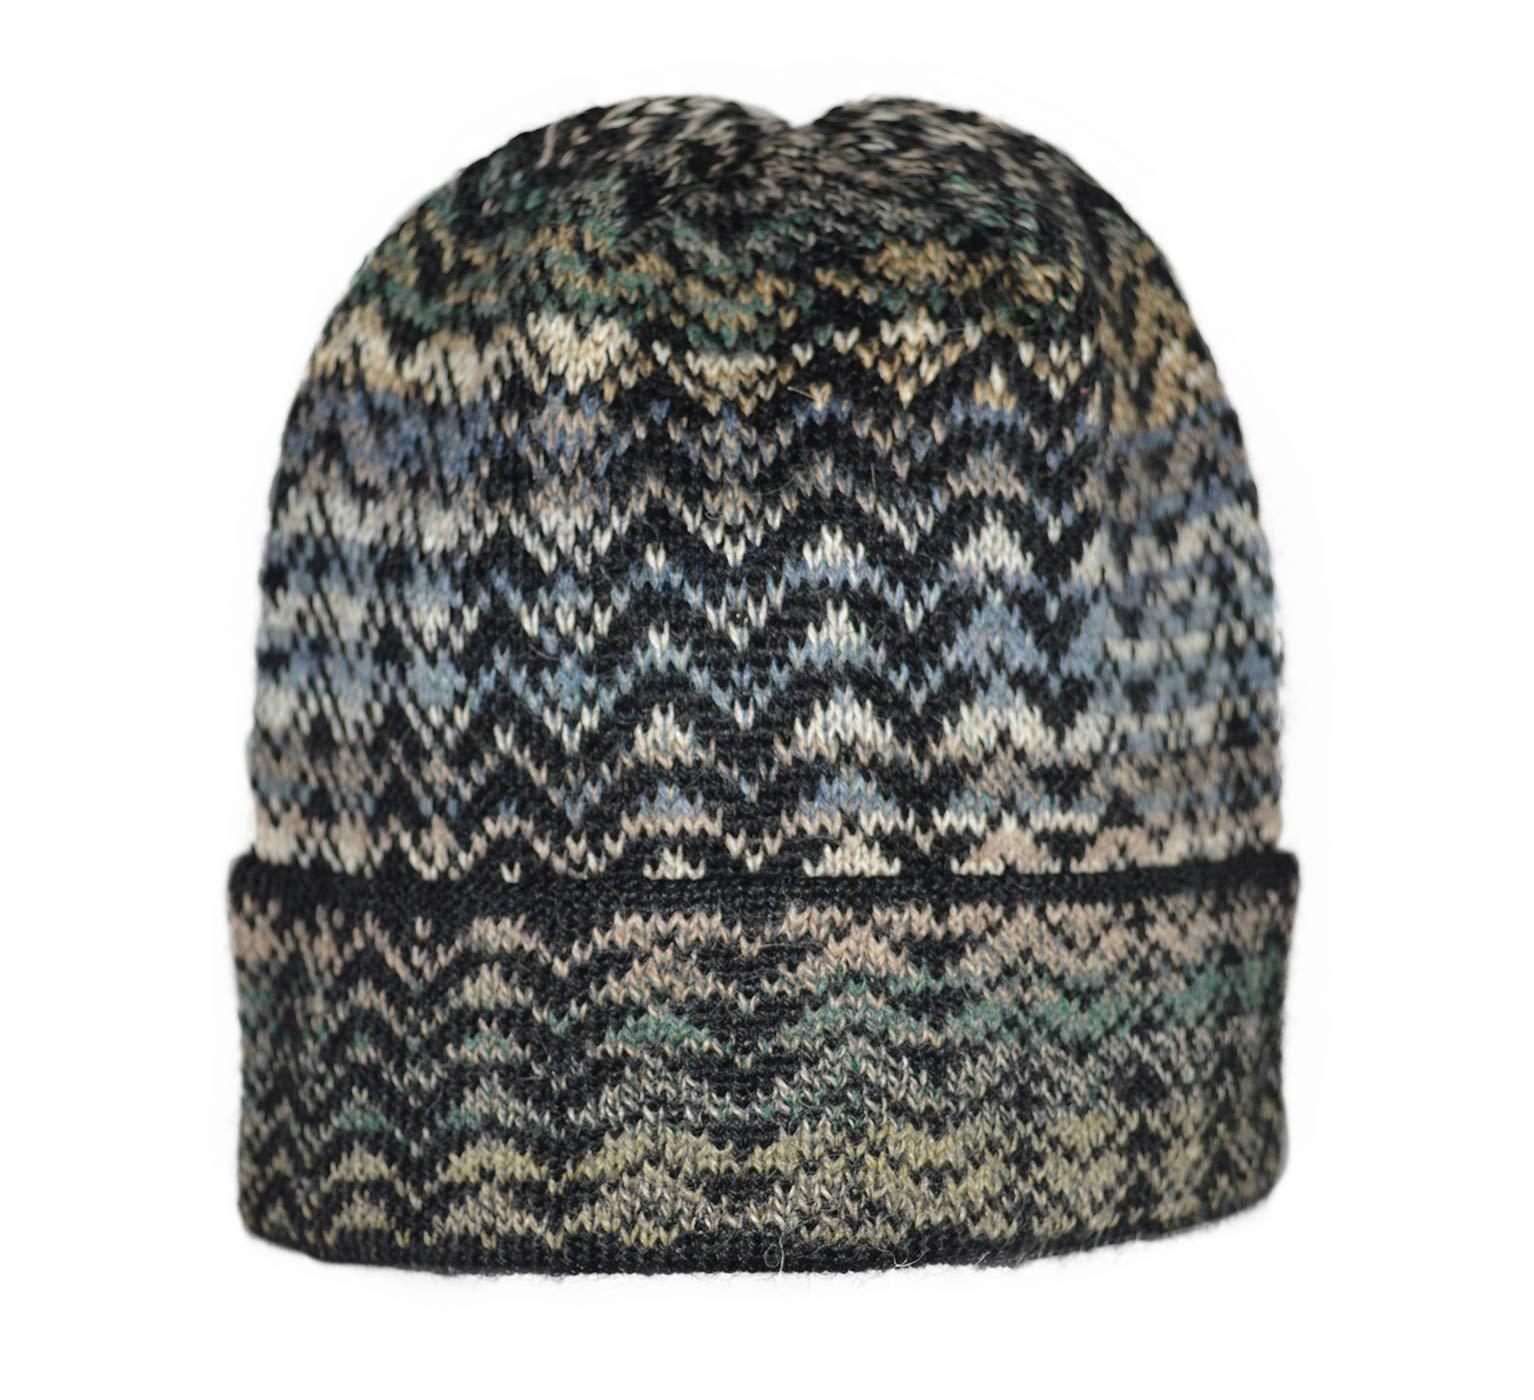 Invisible World Women's 100% Alpaca Wool Hat Knit Unisex Beanie Winter Noelle Blue Medium